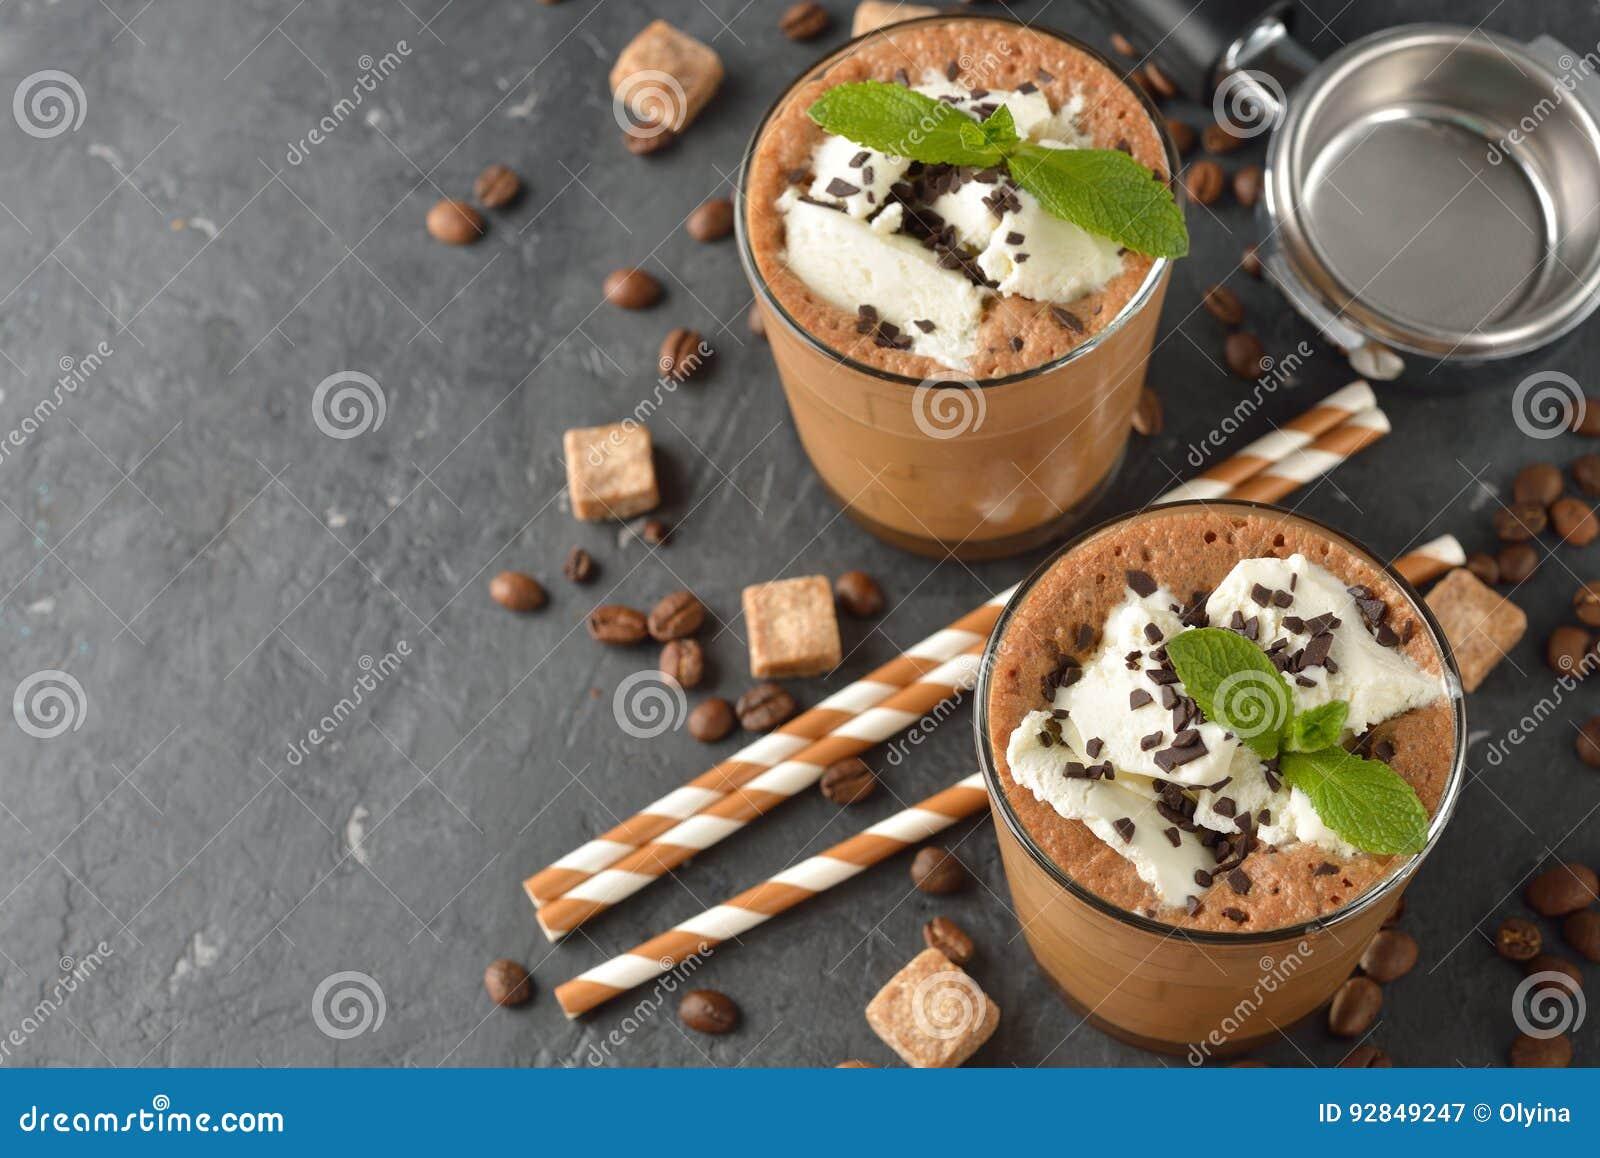 Milkshake met koffie en roomijs